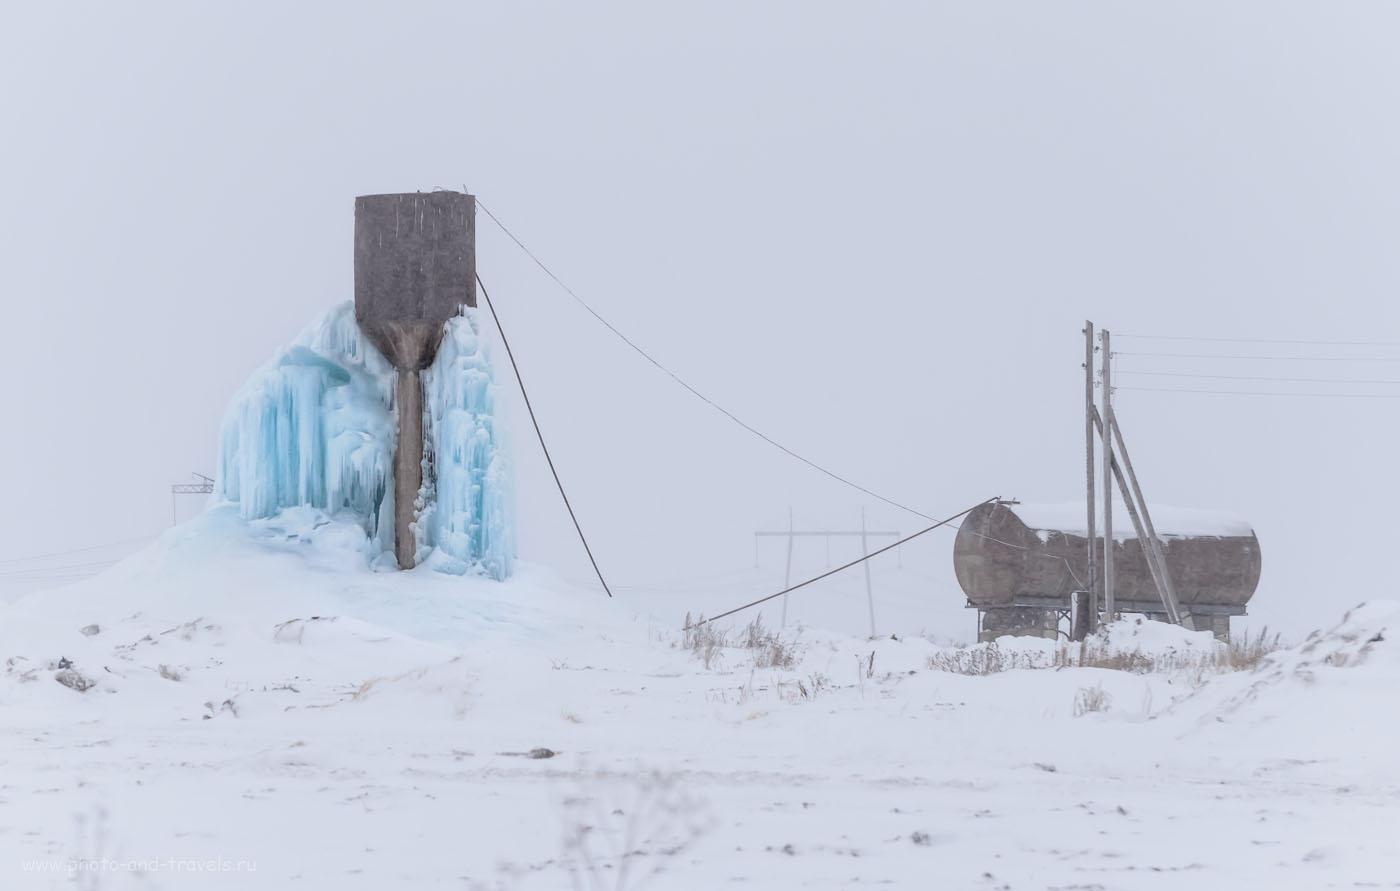 Фотография 4. Ледяной фонтан на Урале. (снято на телеобъектив Никкор 70-300 со следующими настройками: 1/2500 сек, f/4.8, 155 мм, 640)